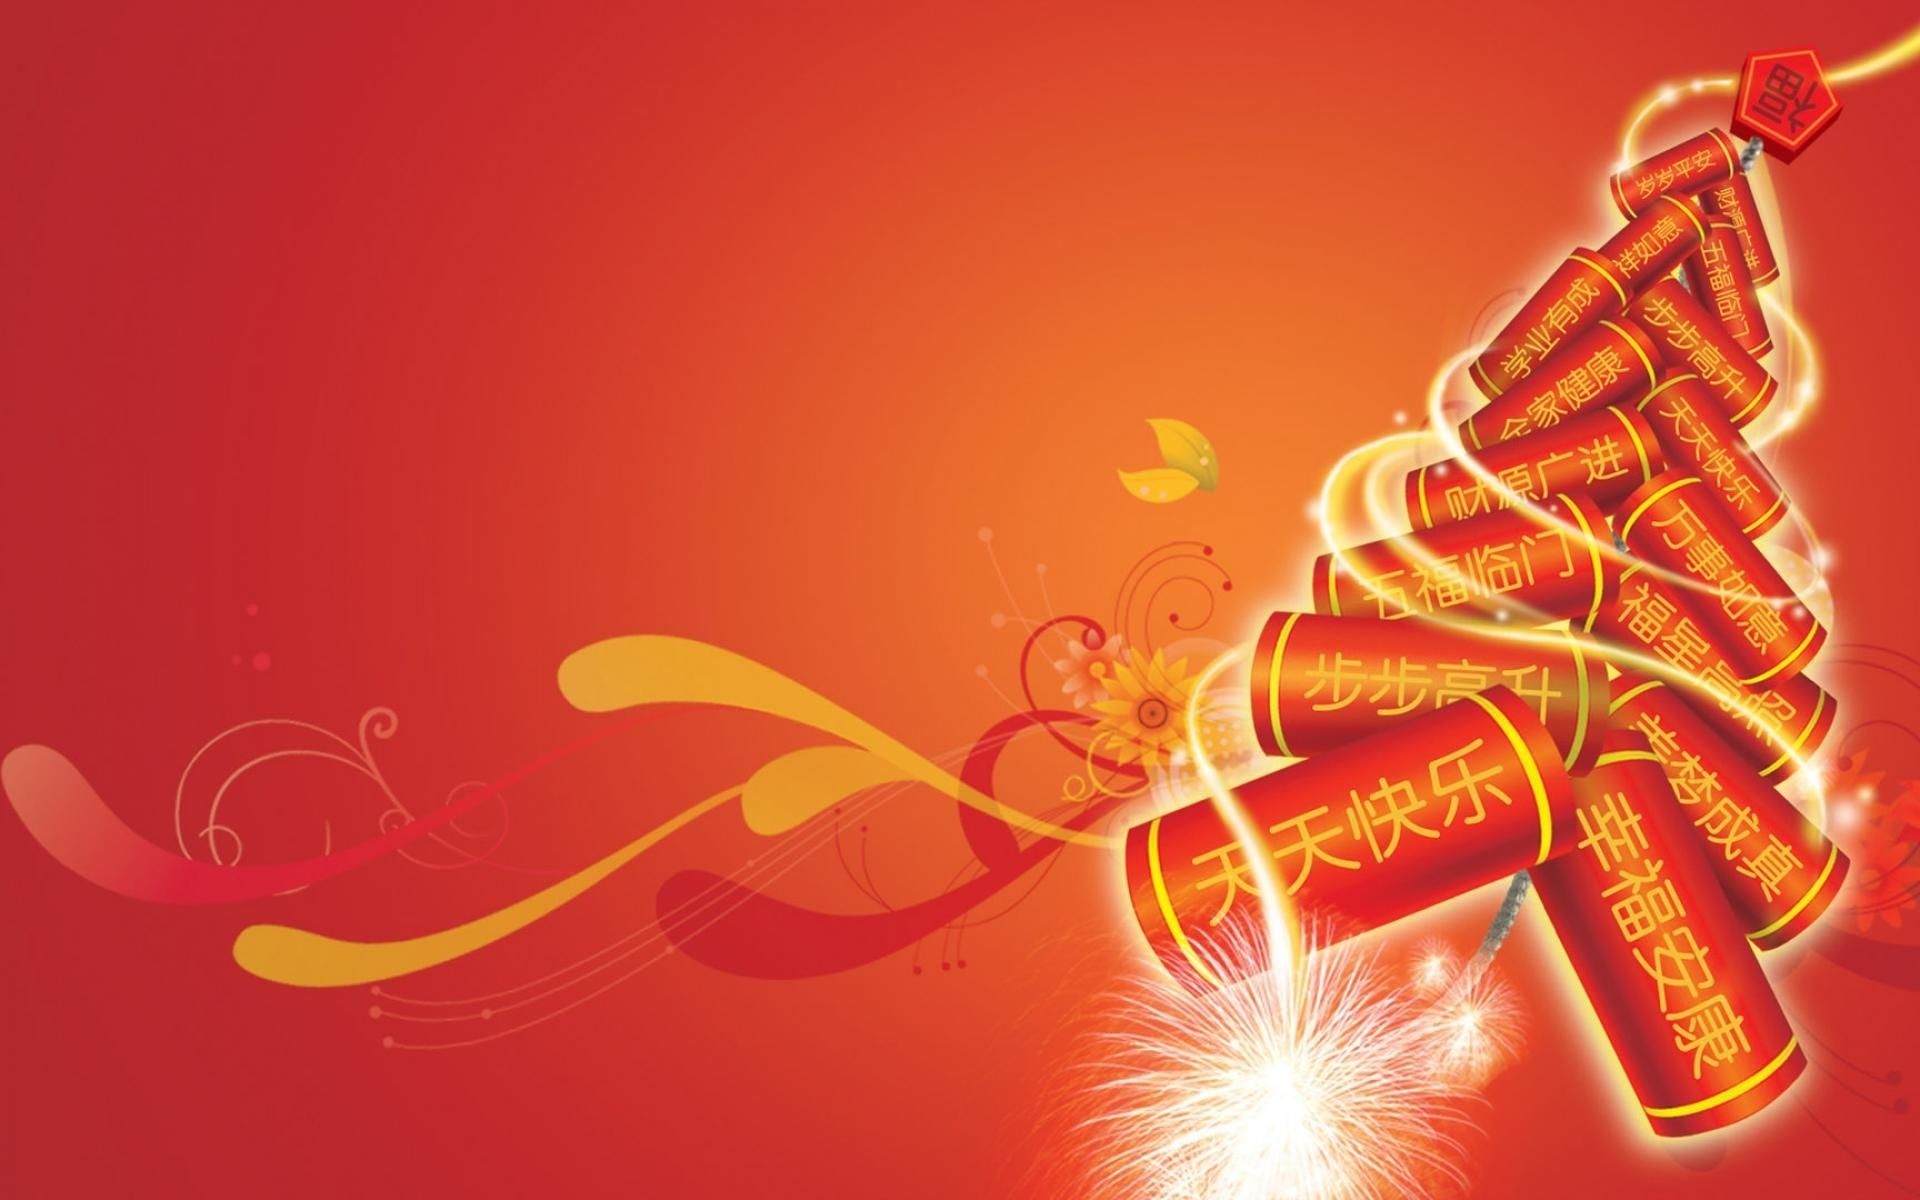 lunar new year #wallpaper - hd wallpapers